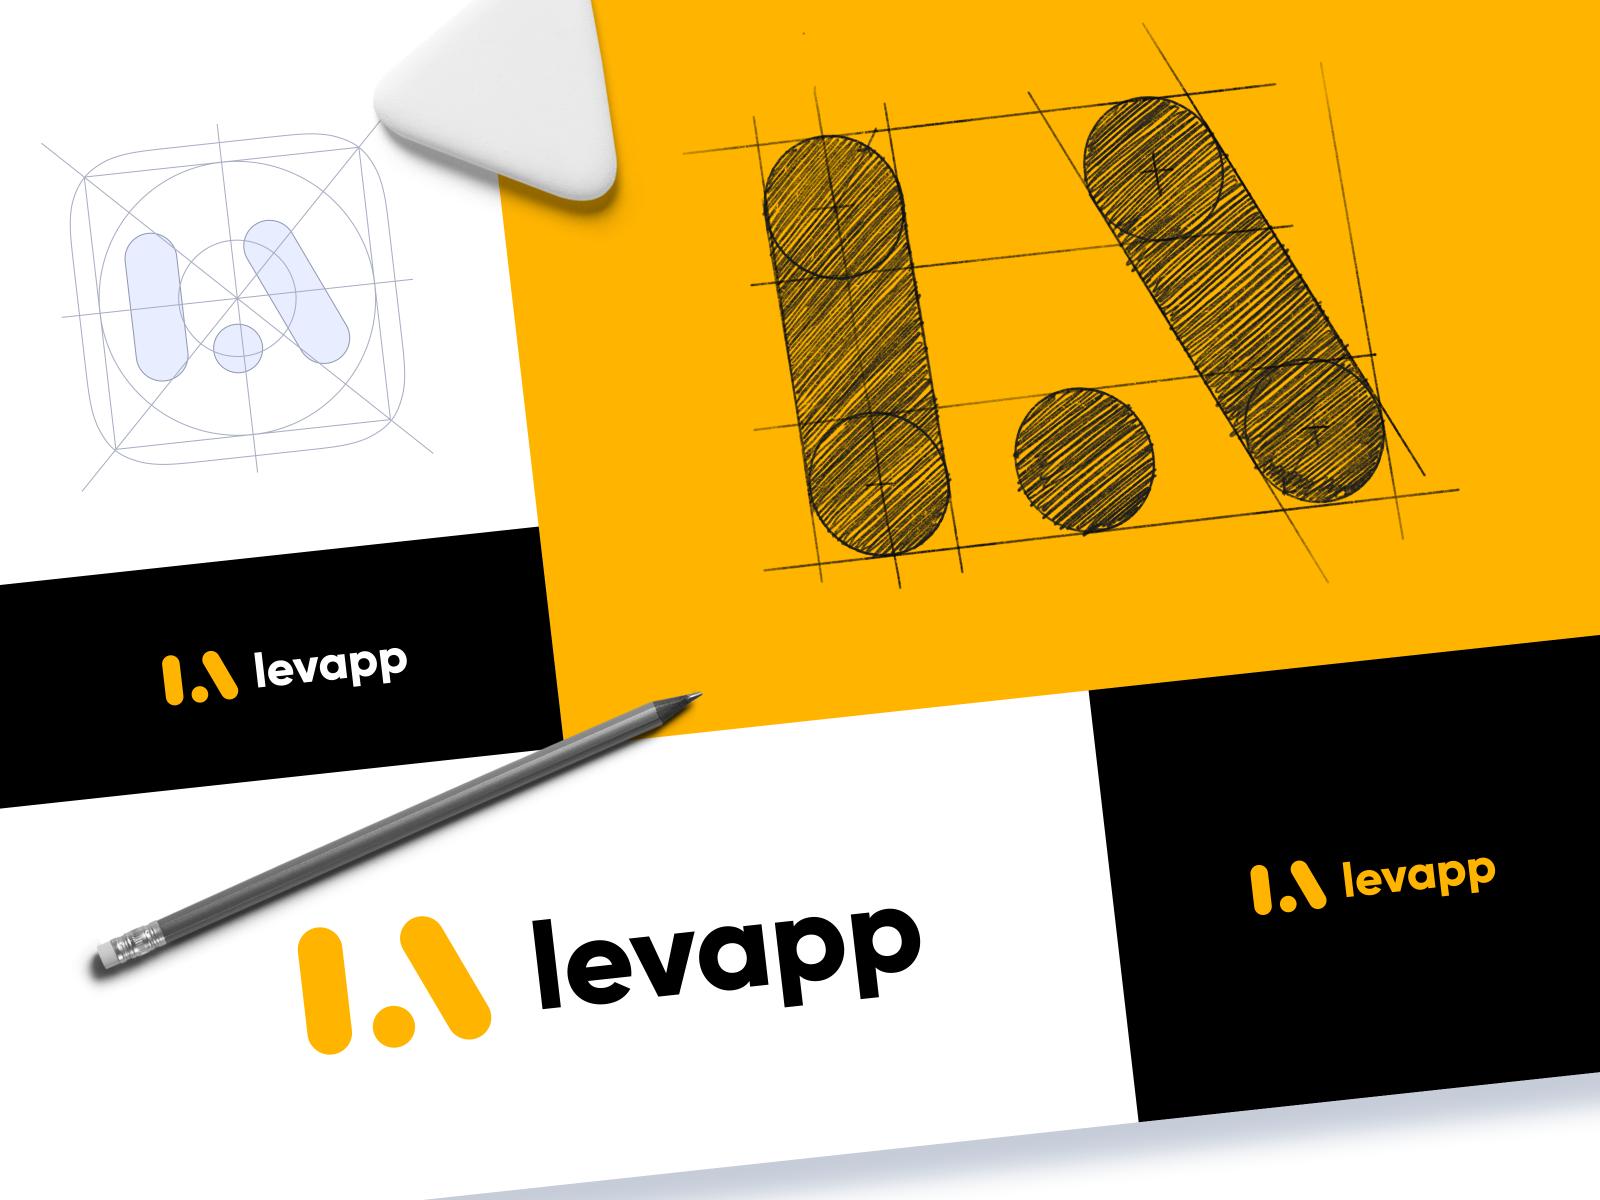 logo design levapp laundry service